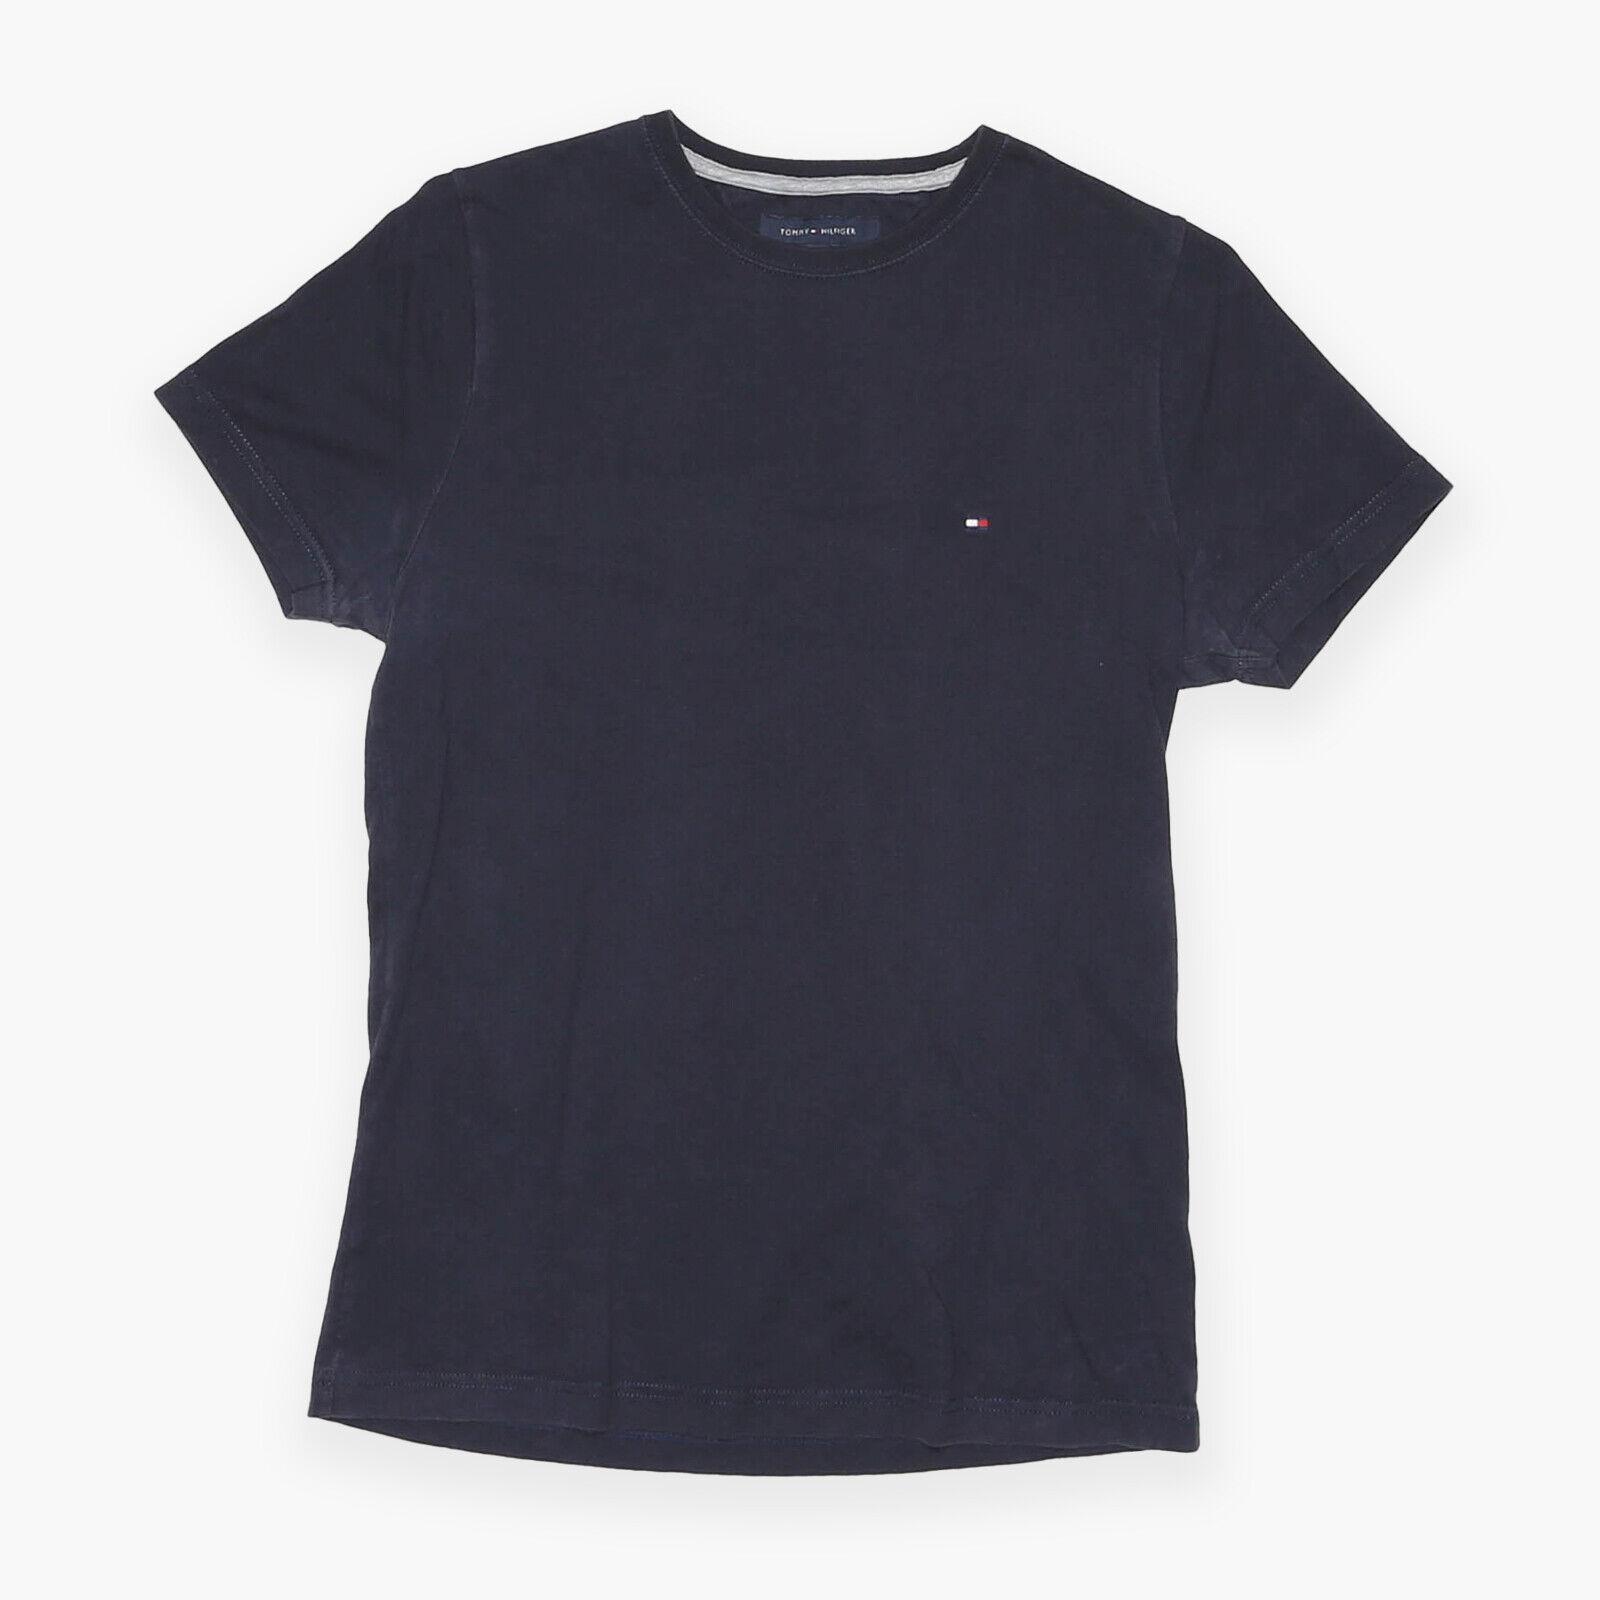 TOMMY HILFIGER Blue Regular Short Sleeve T-Shirt Mens S